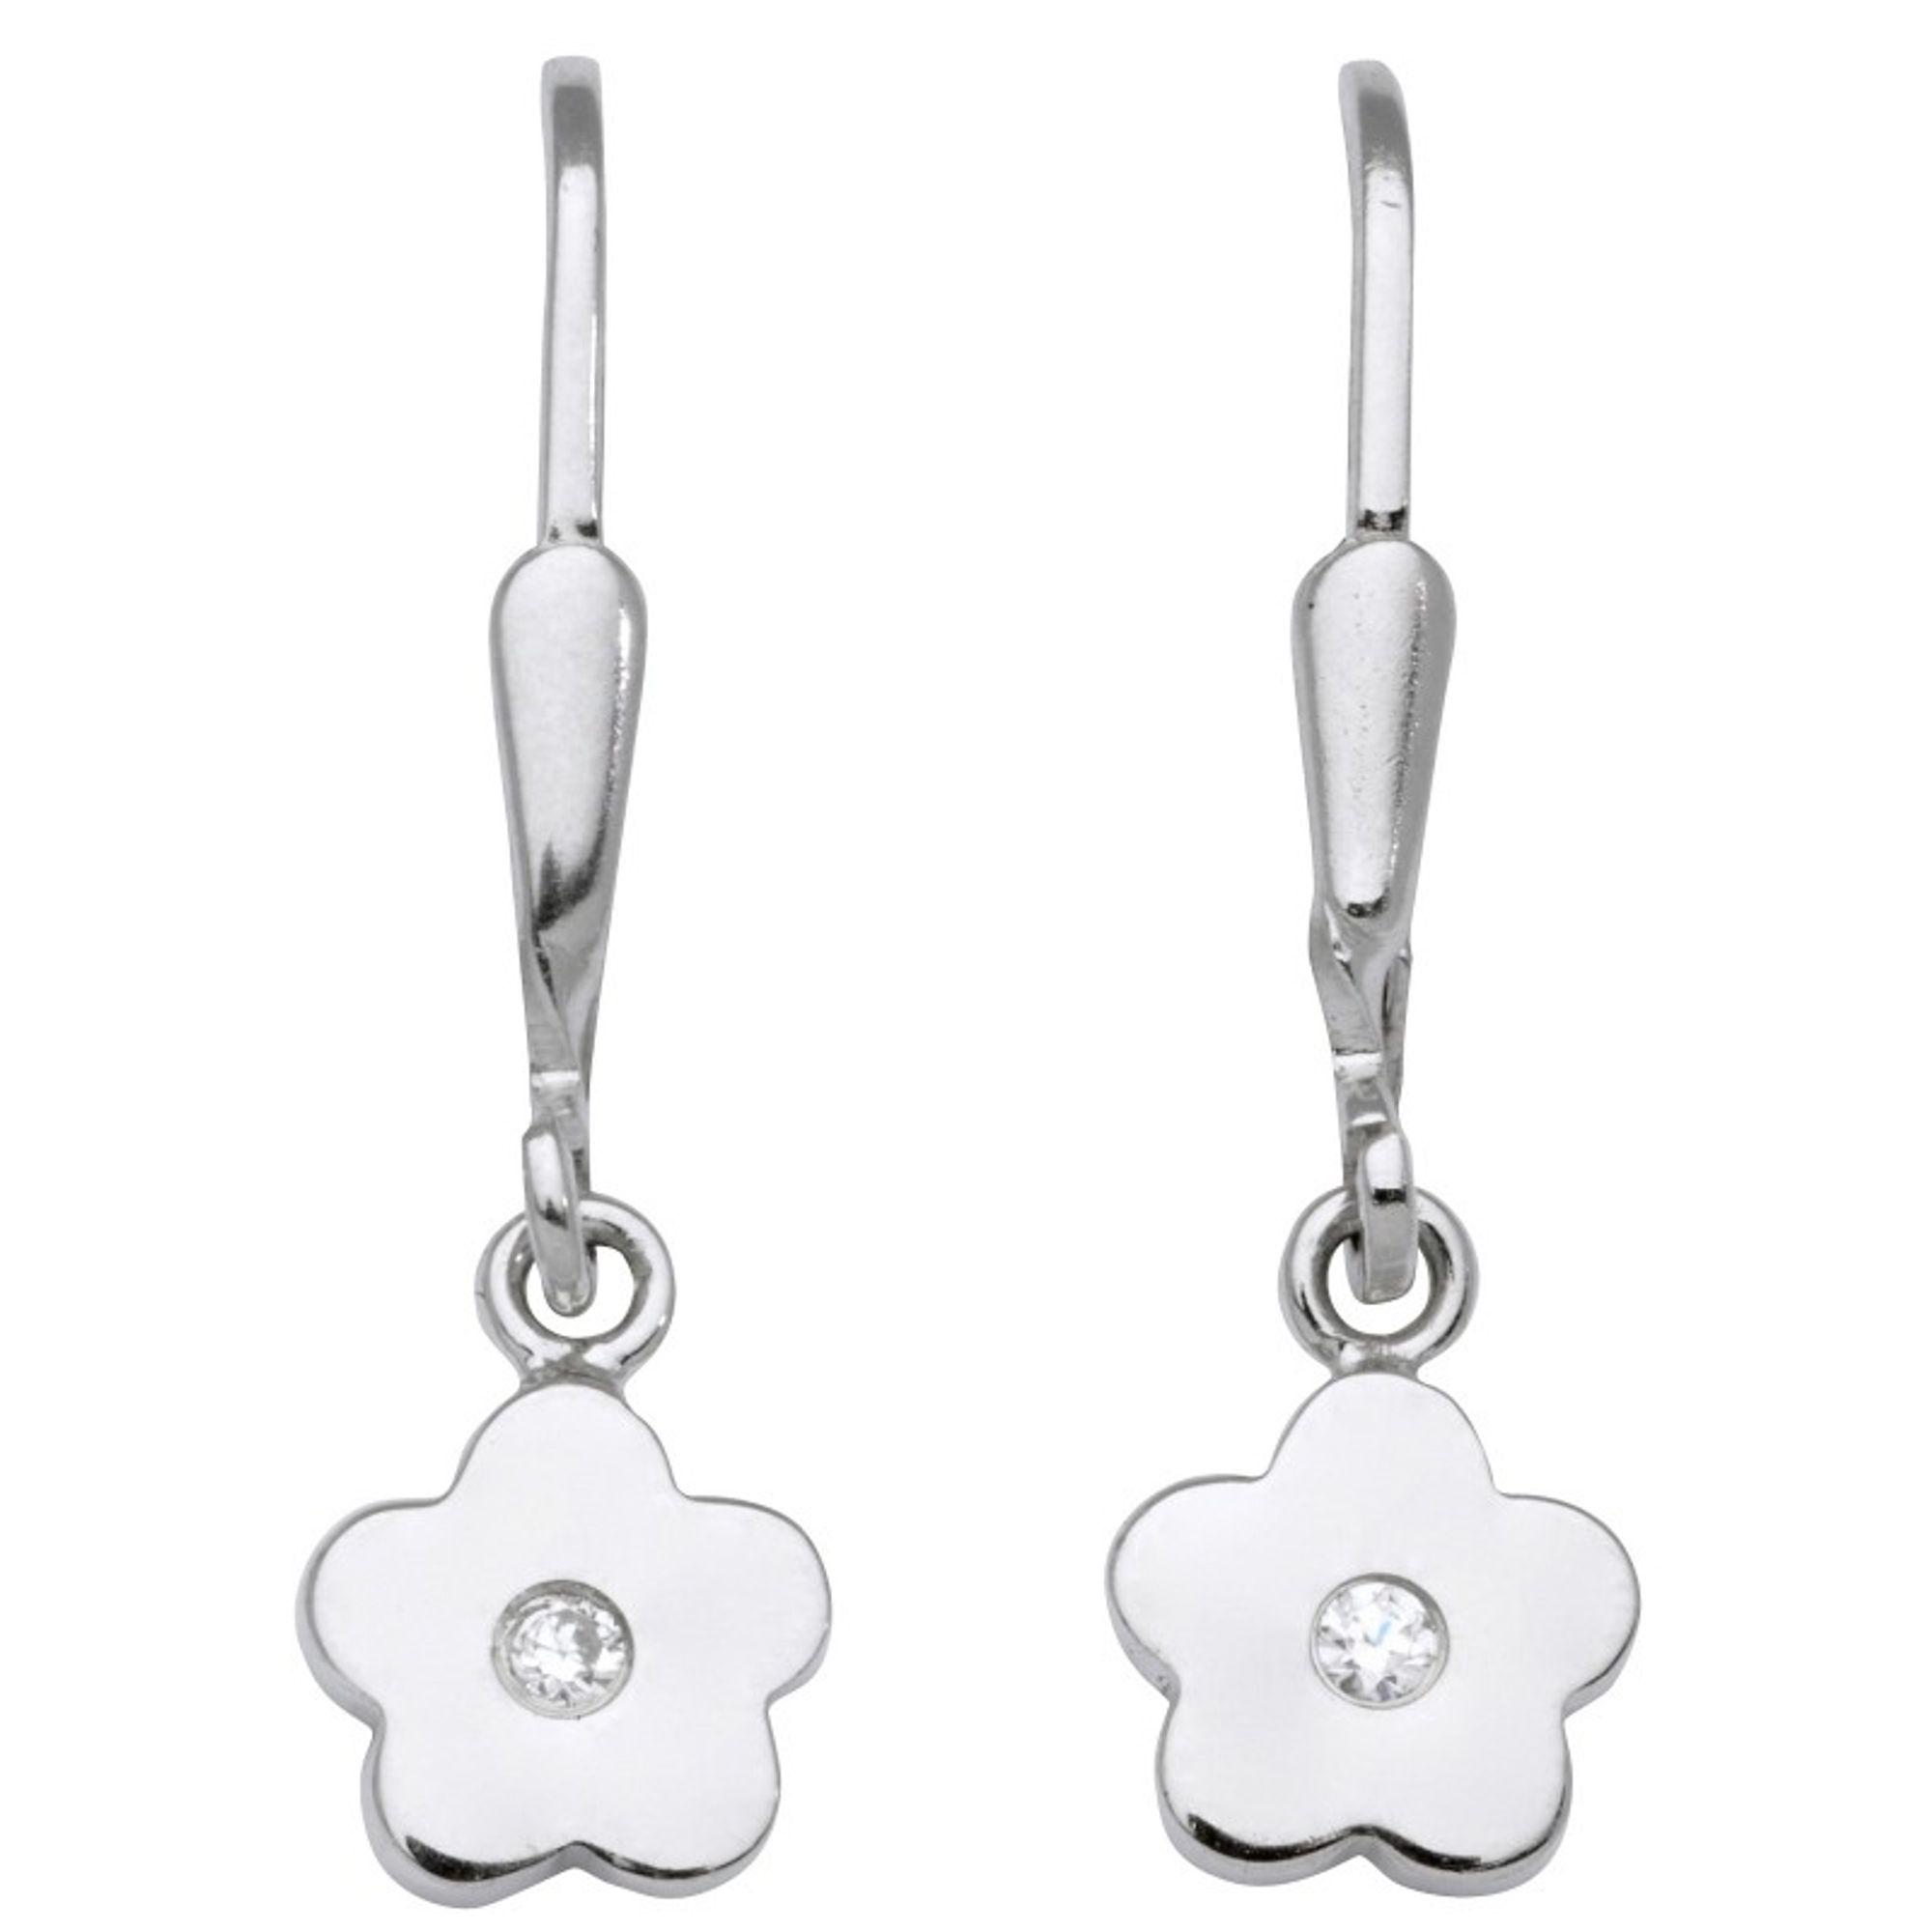 Basic Silber SK06 Kinder Ohrringe Blume Silber Weiß Zirkonia